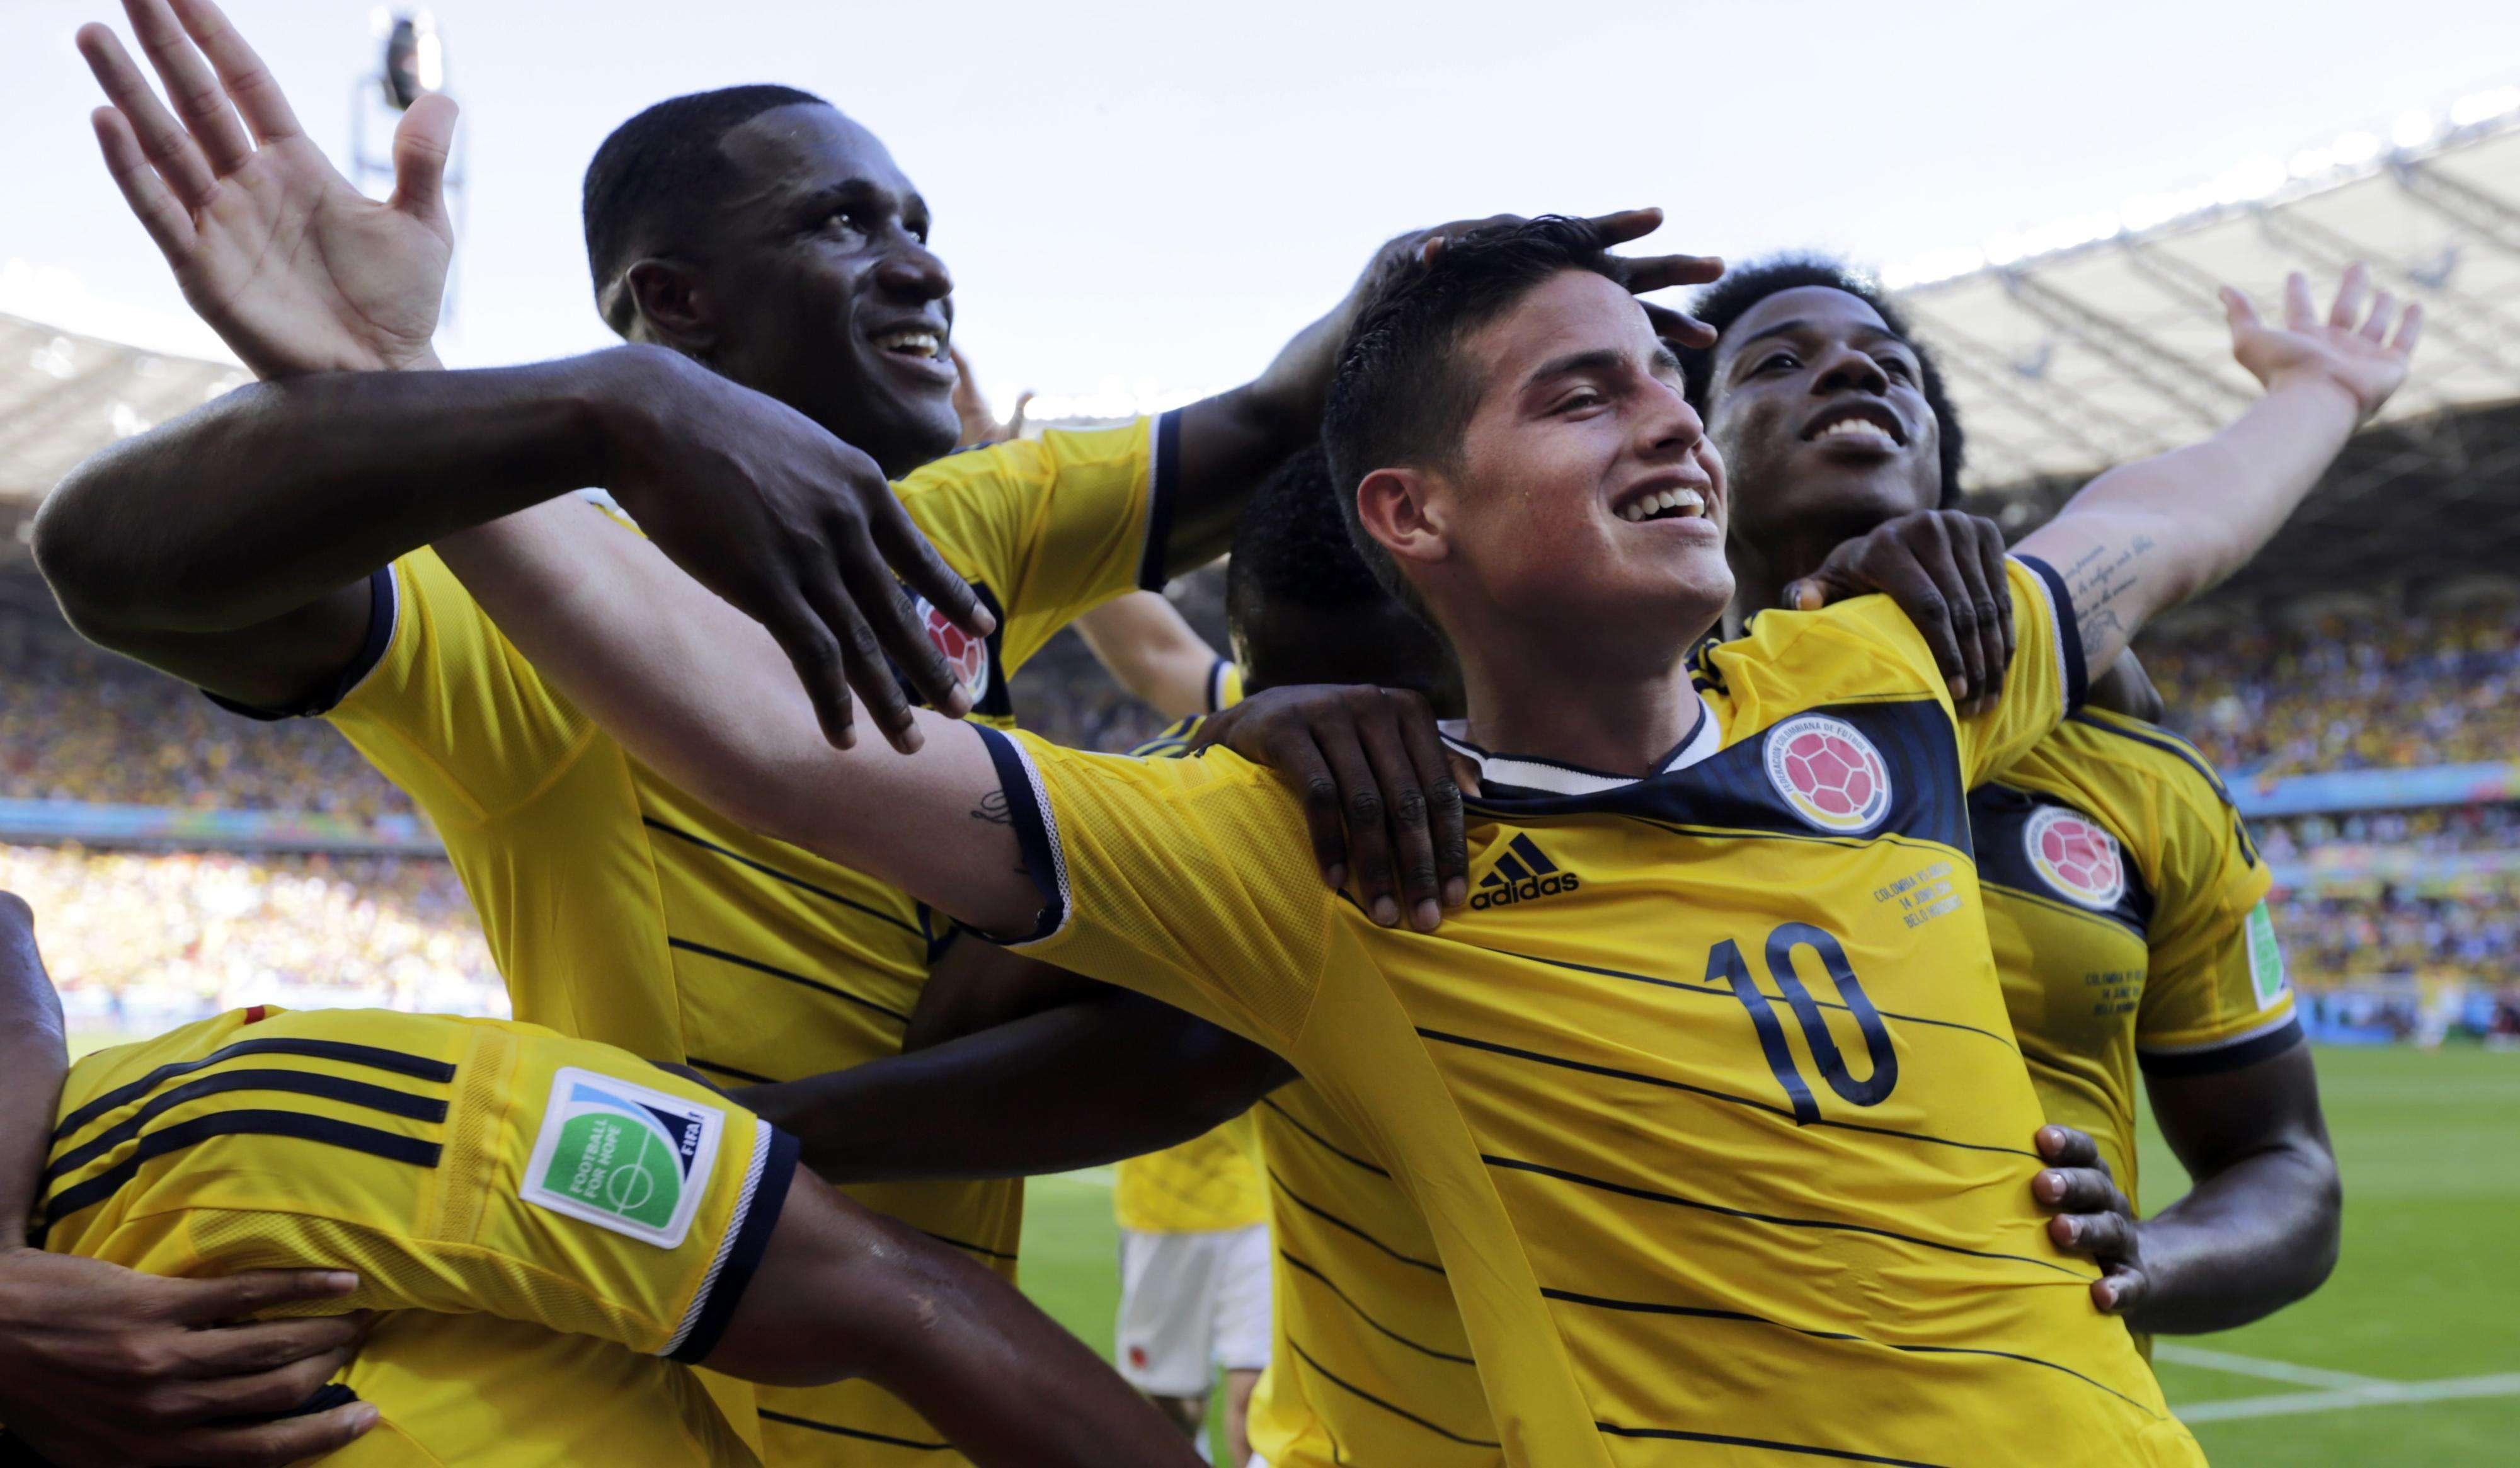 14 de junho de 2014 - Colômbia 3 x 0 Grécia Foto: Reuters